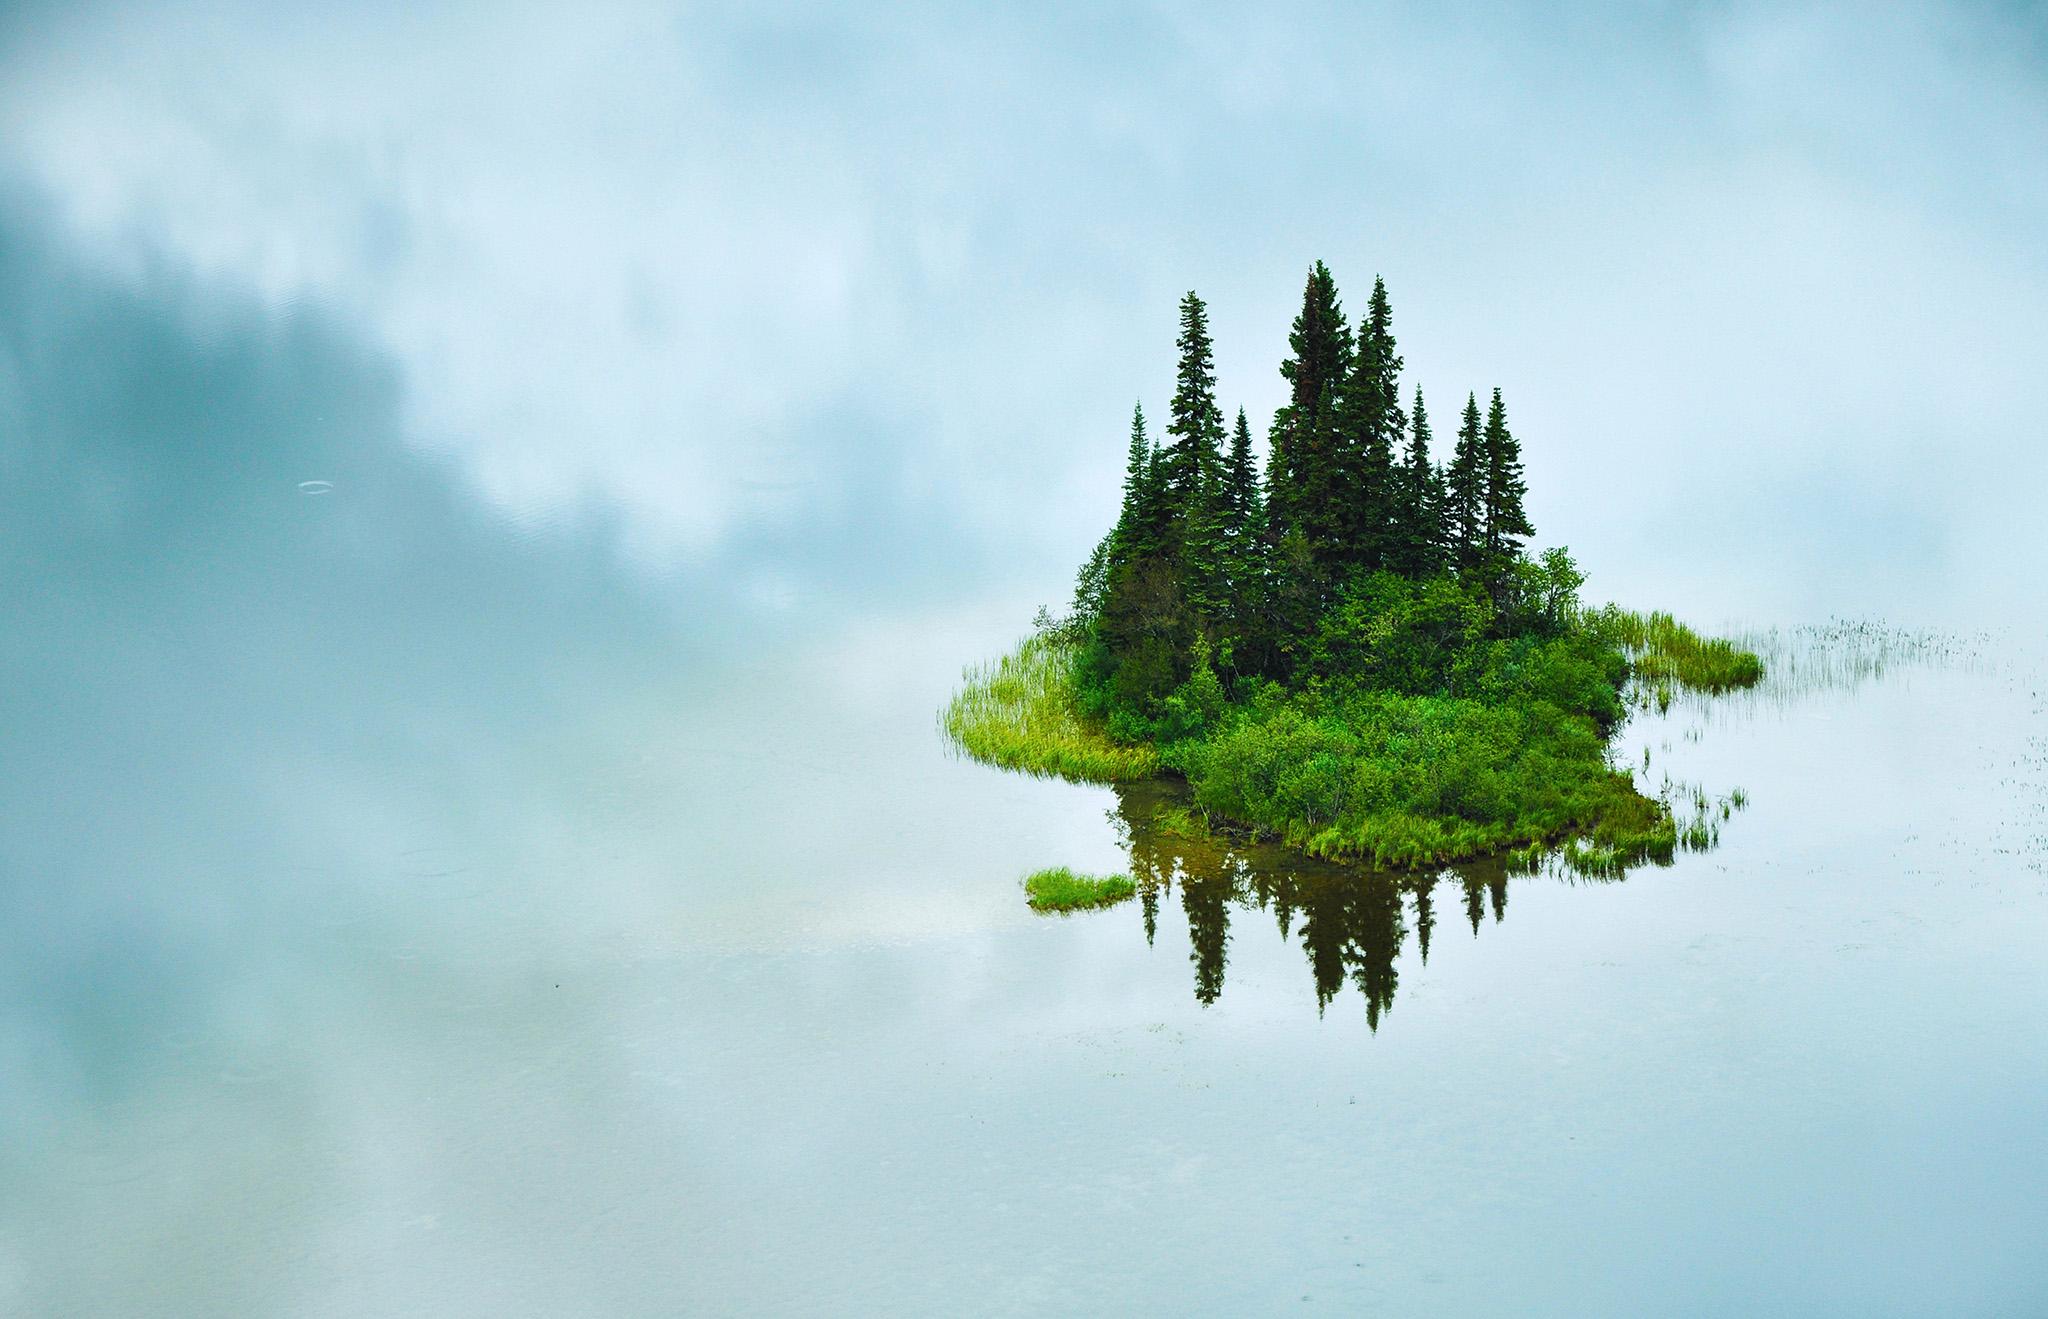 The Floating Island - 2014-04-01_242536_outdoor-scenes.jpg